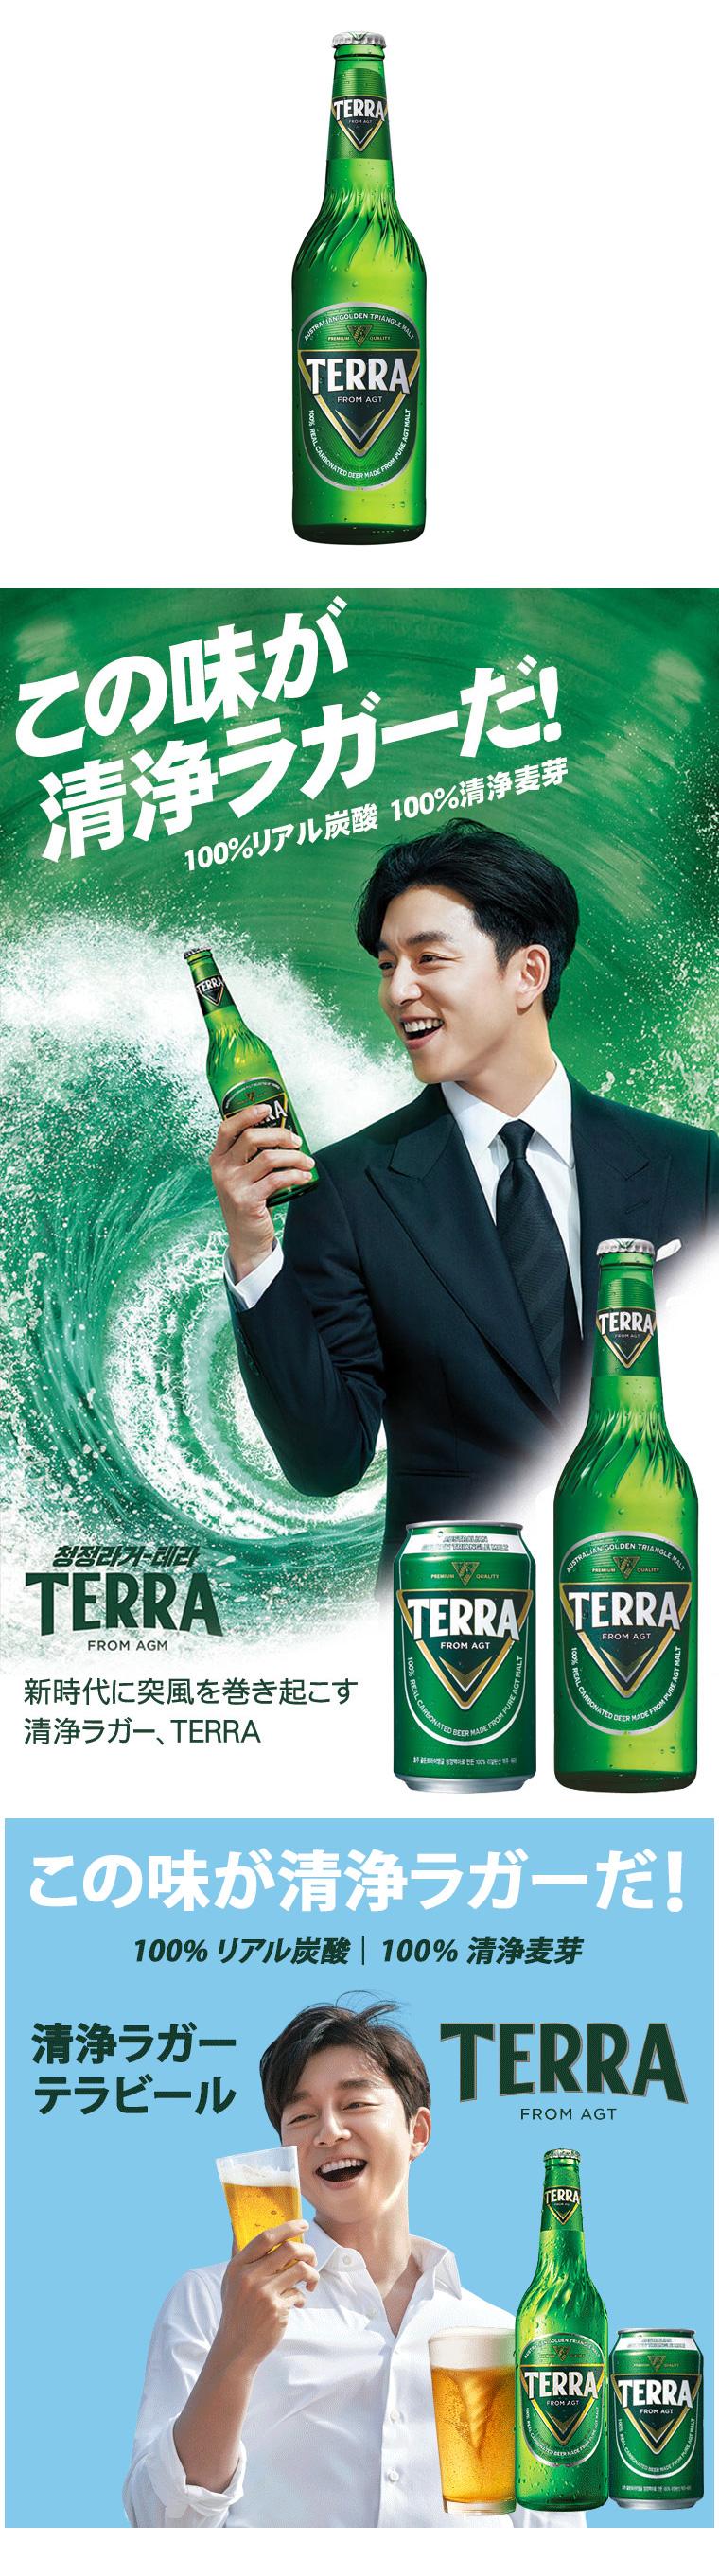 jinro TERRA テラビール / 瓶ビール